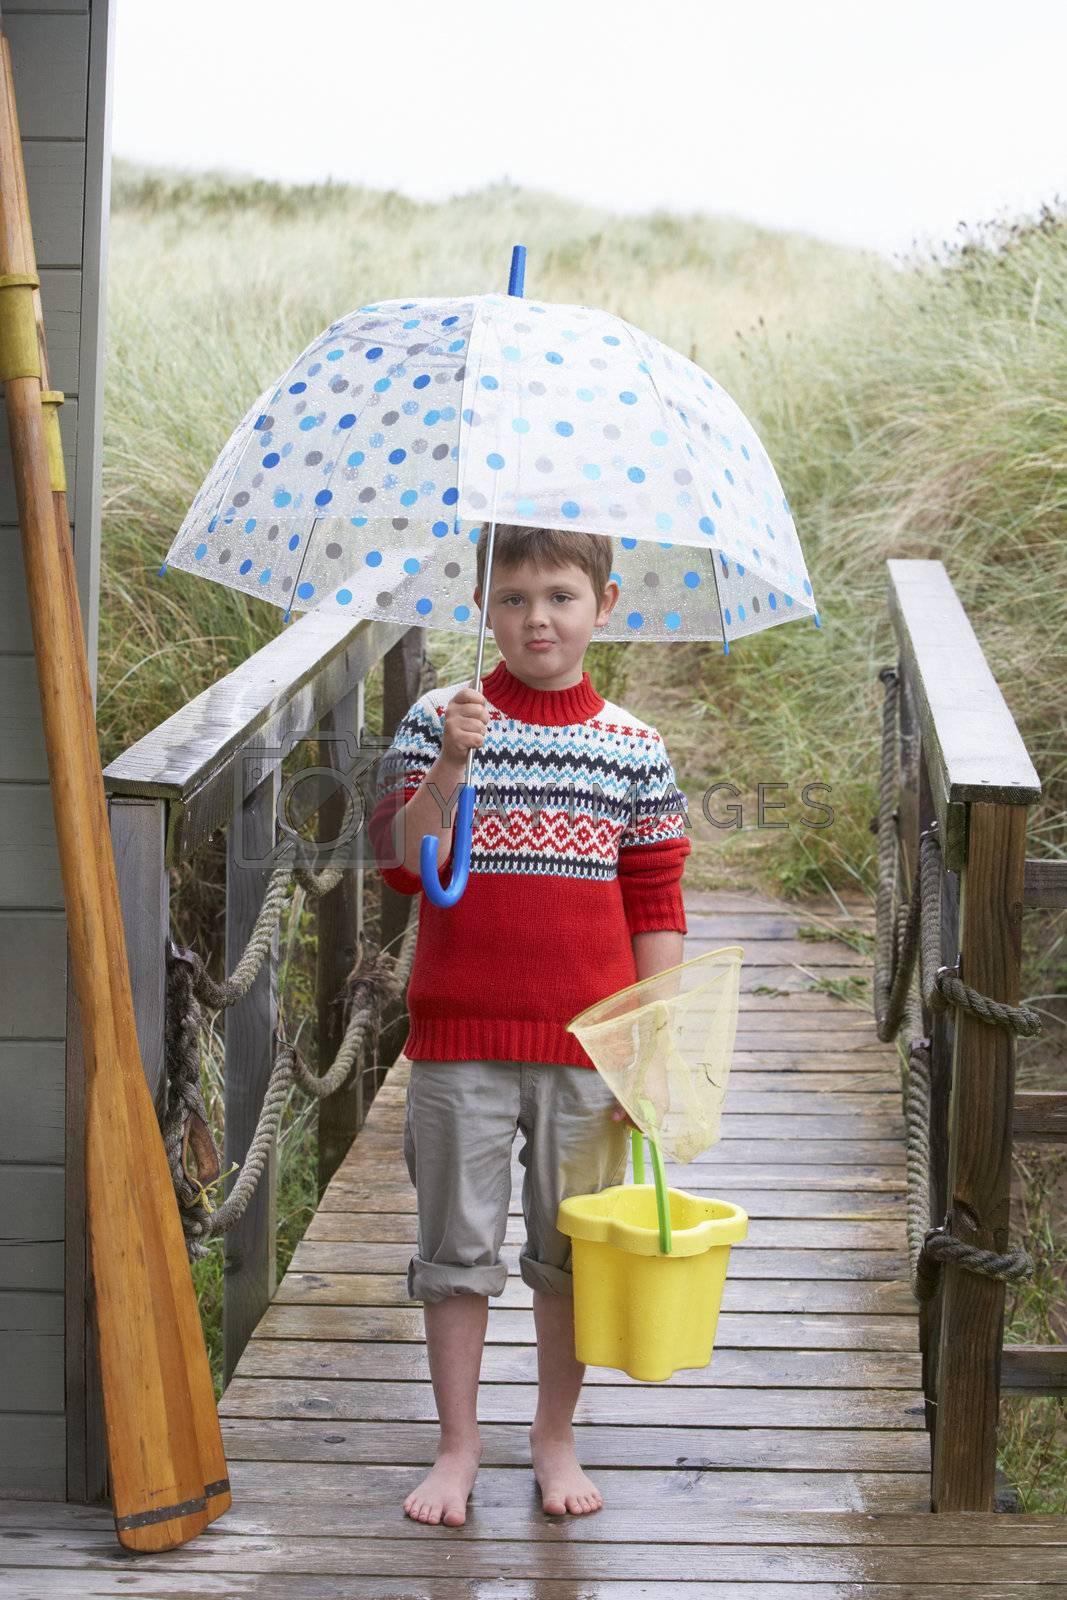 Boy standing on footbridge with umbrella